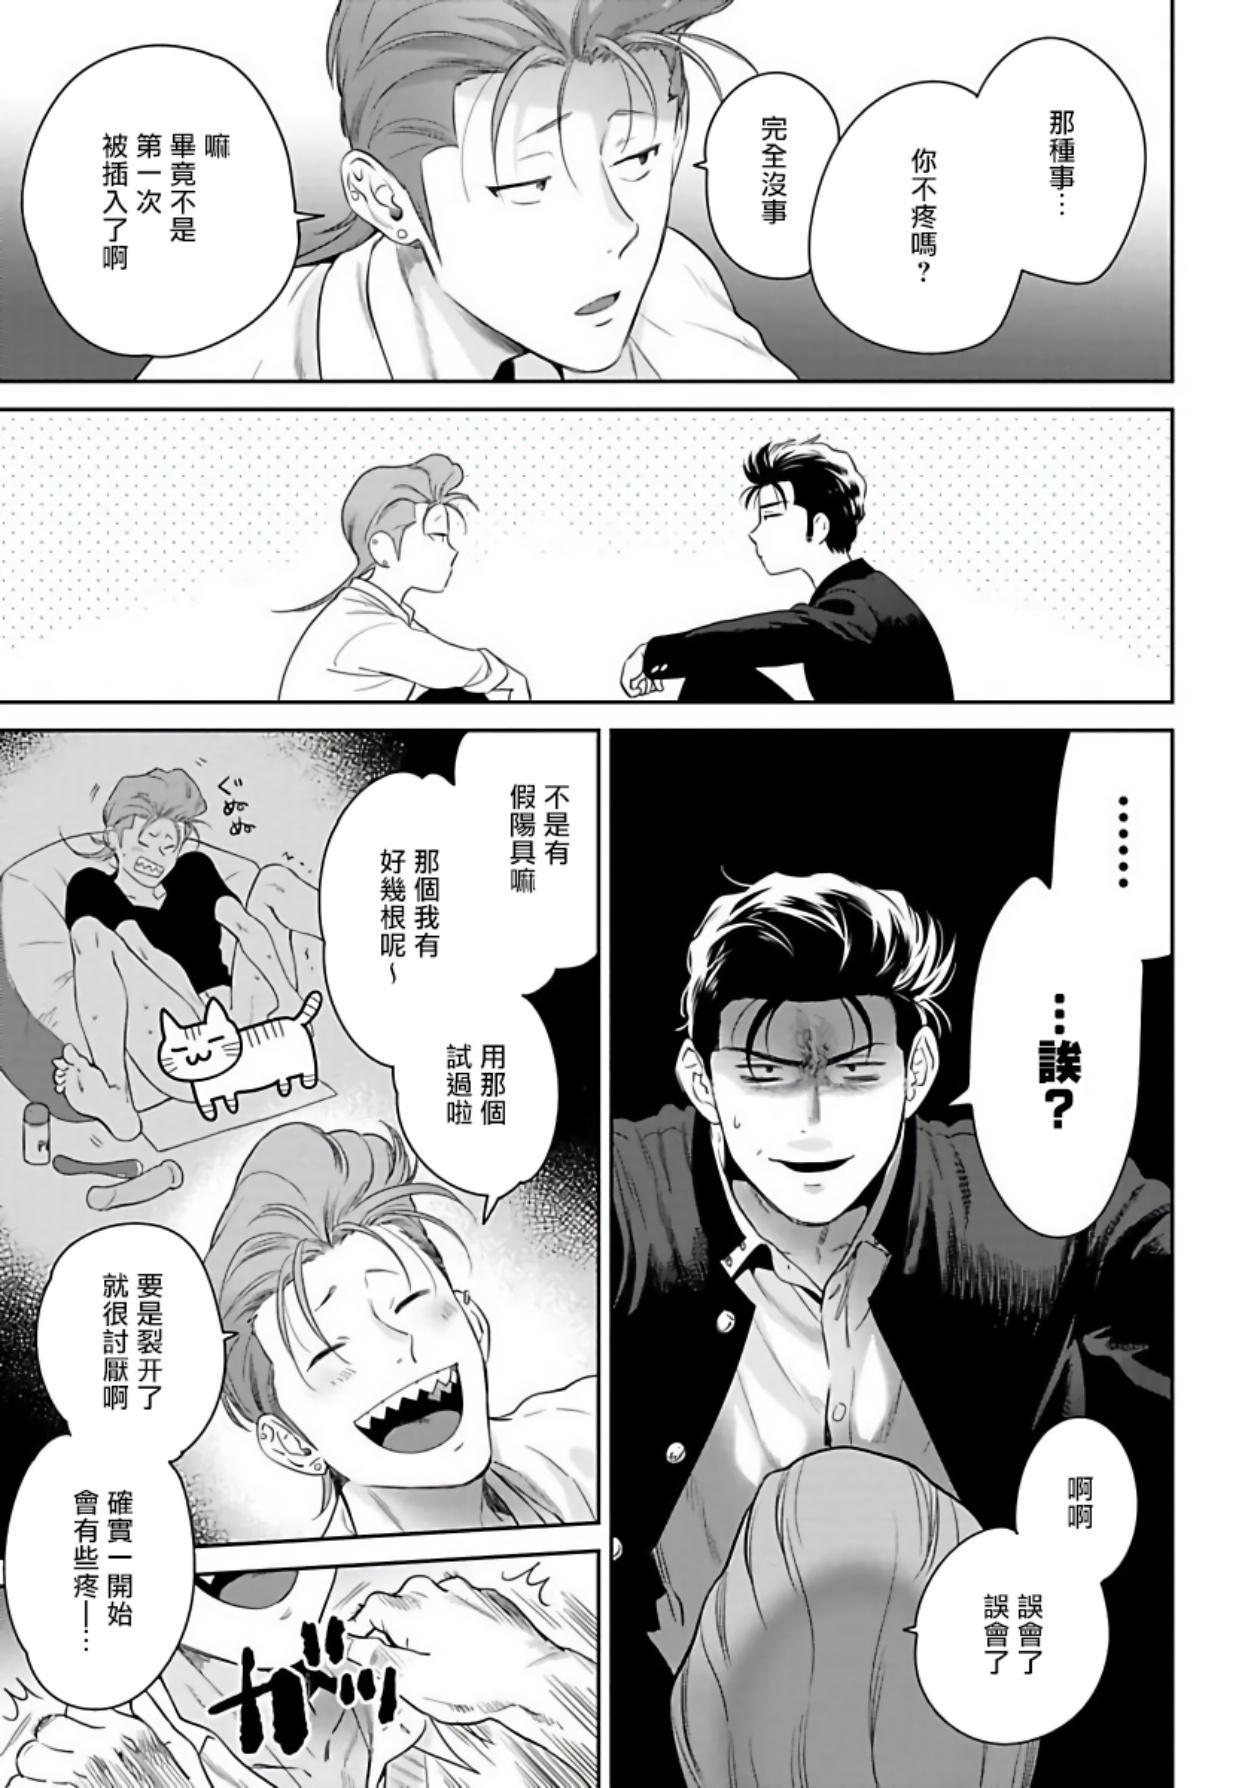 Nakasete Yaru yo Yankee-kun   让你哭噢小混混 番外 1